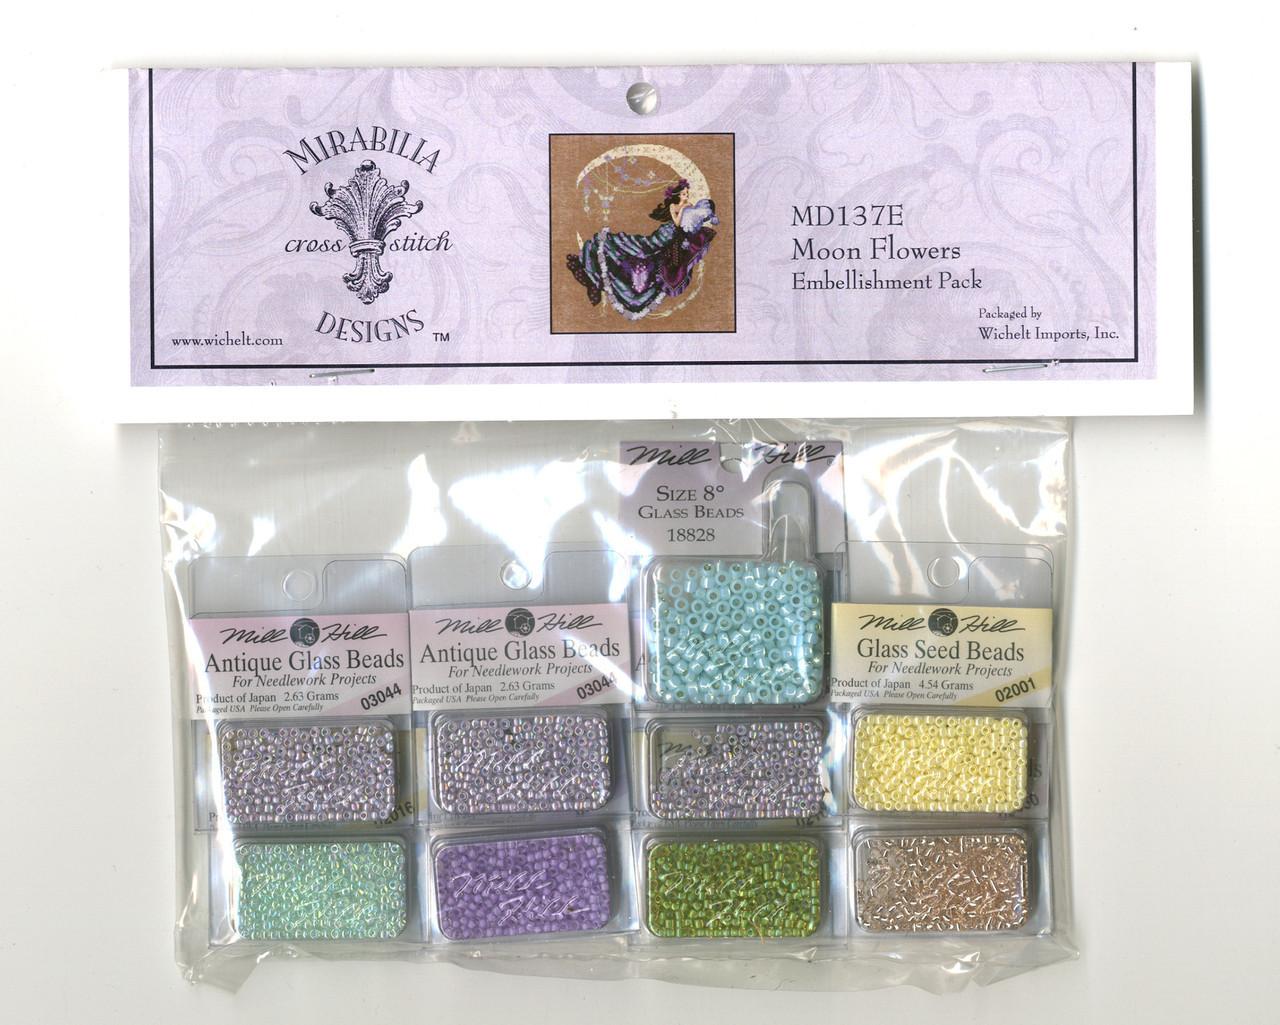 Mirabilia Embellishment Pack - Moon Flowers